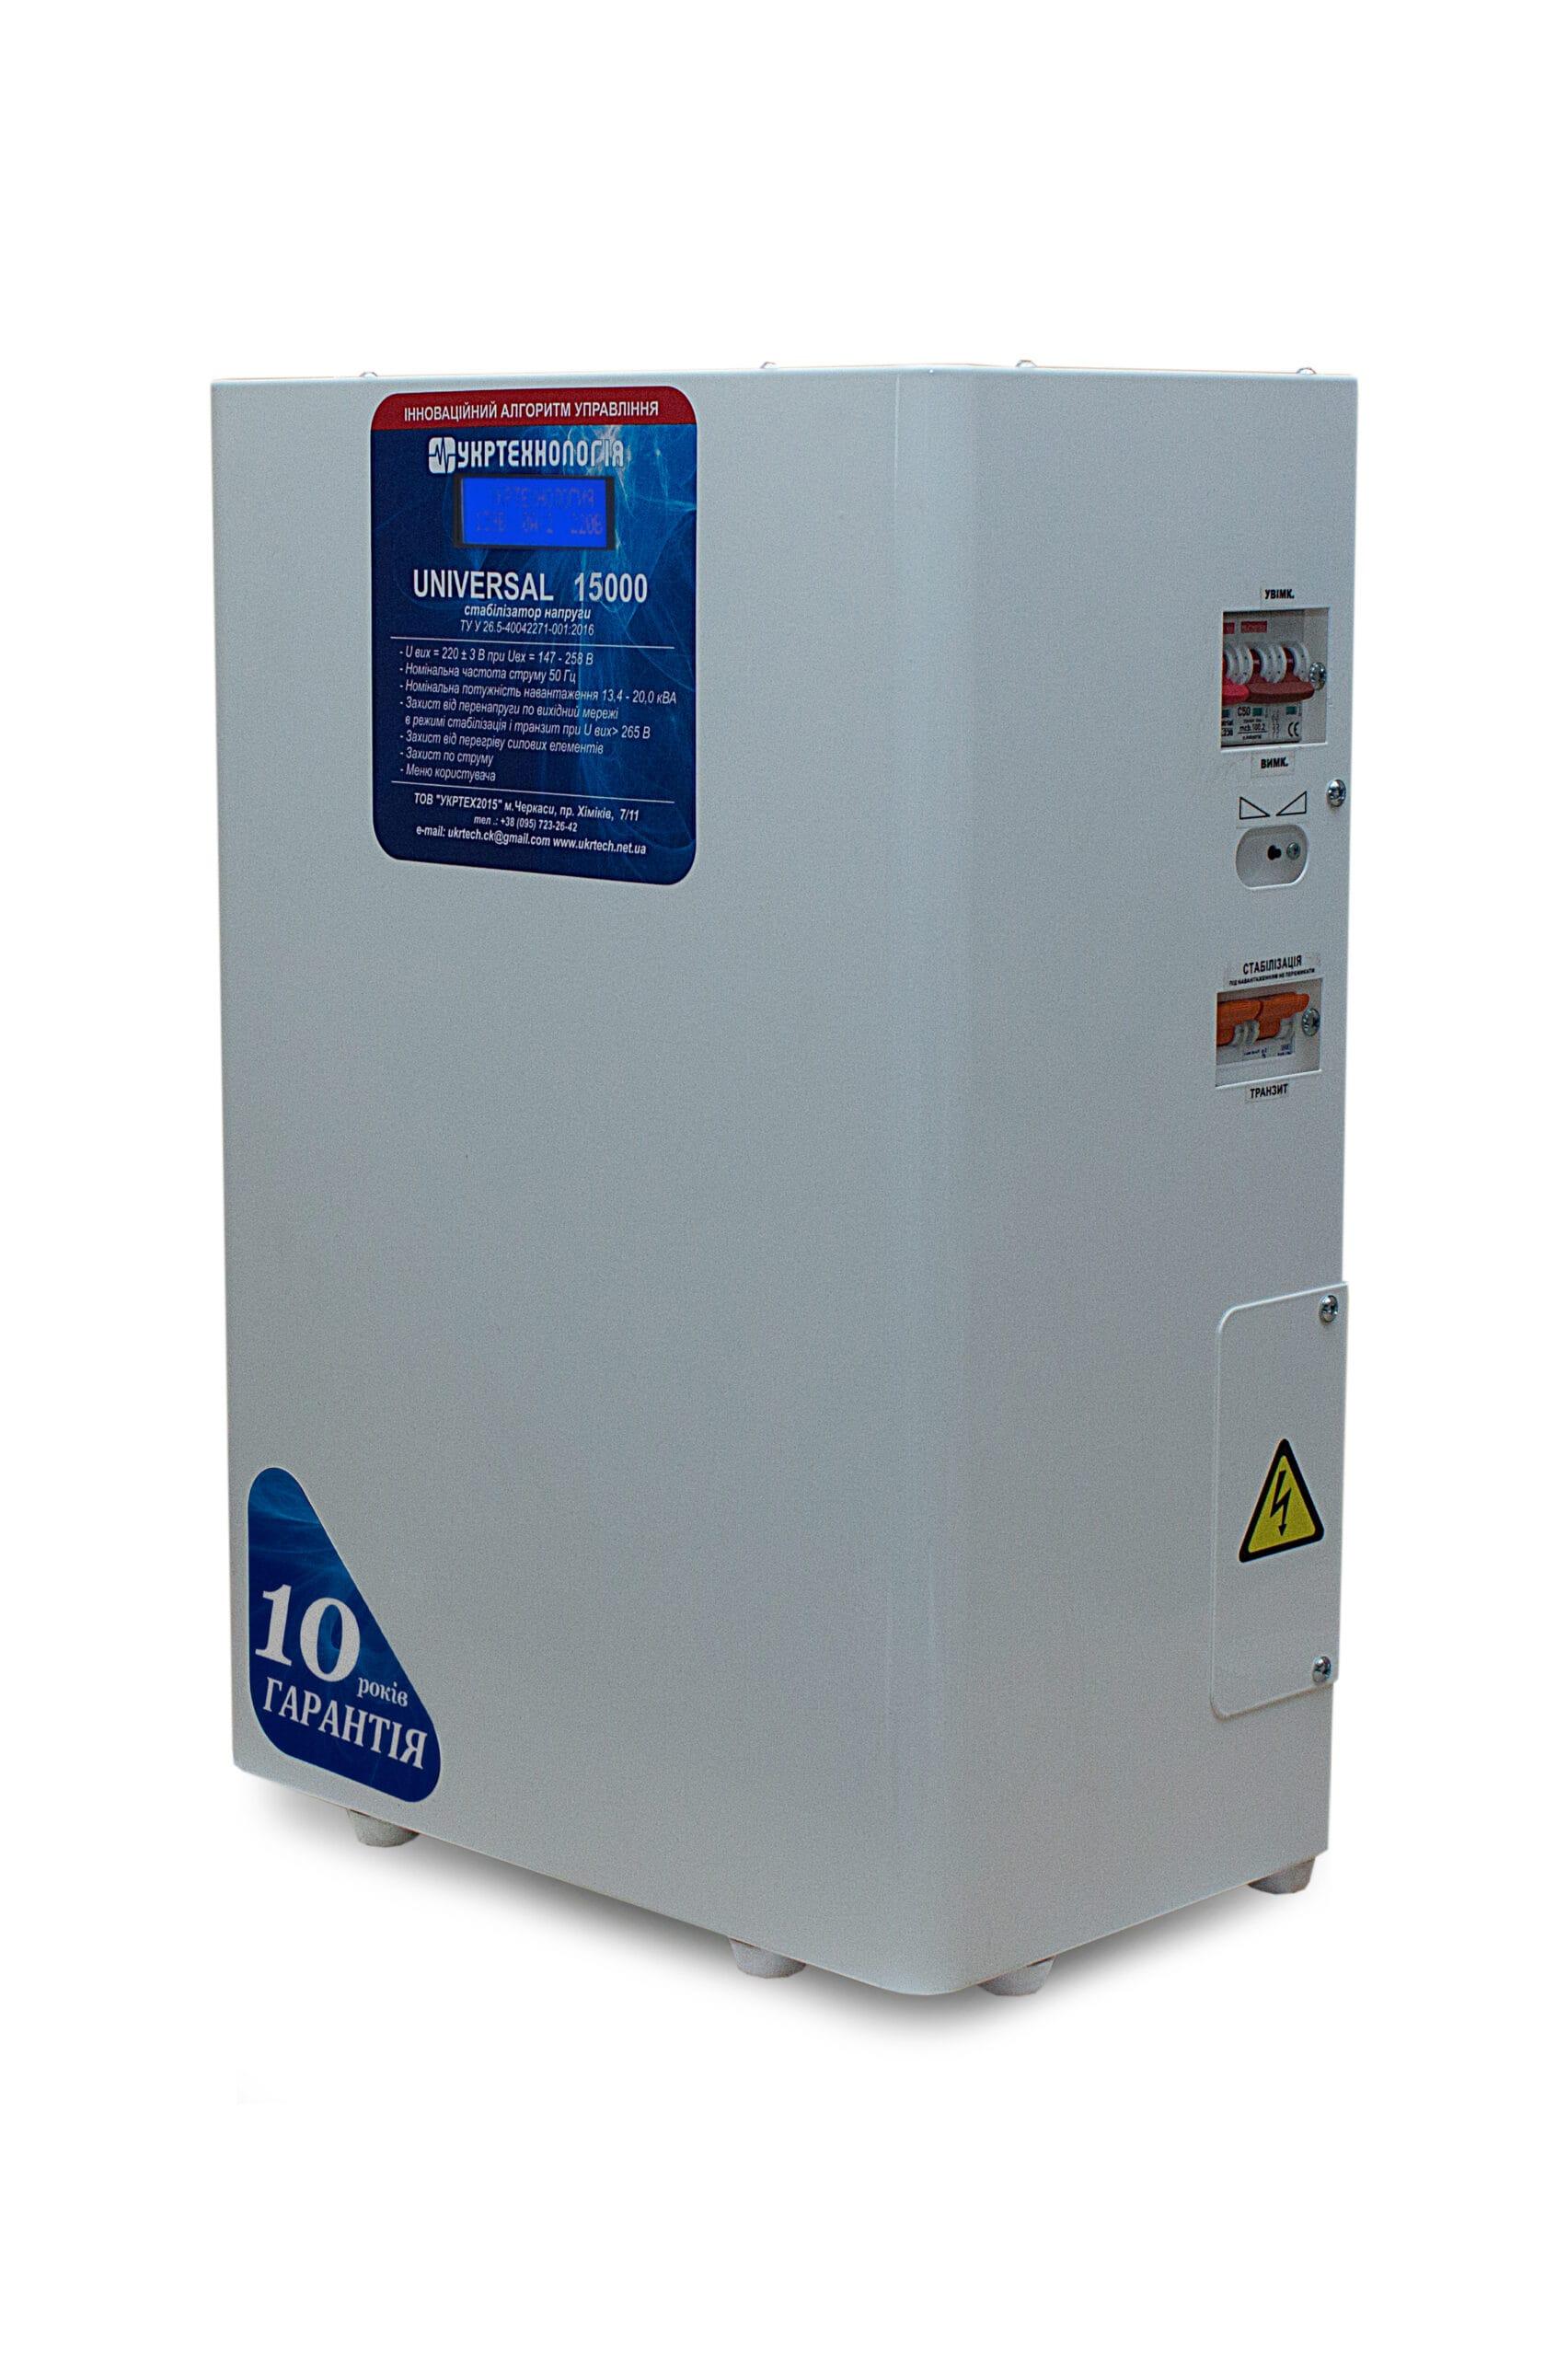 Стабилизаторы напряжения - Стабилизатор напряжения 15 кВт UNIVERSAL 000001421 - Фото 1